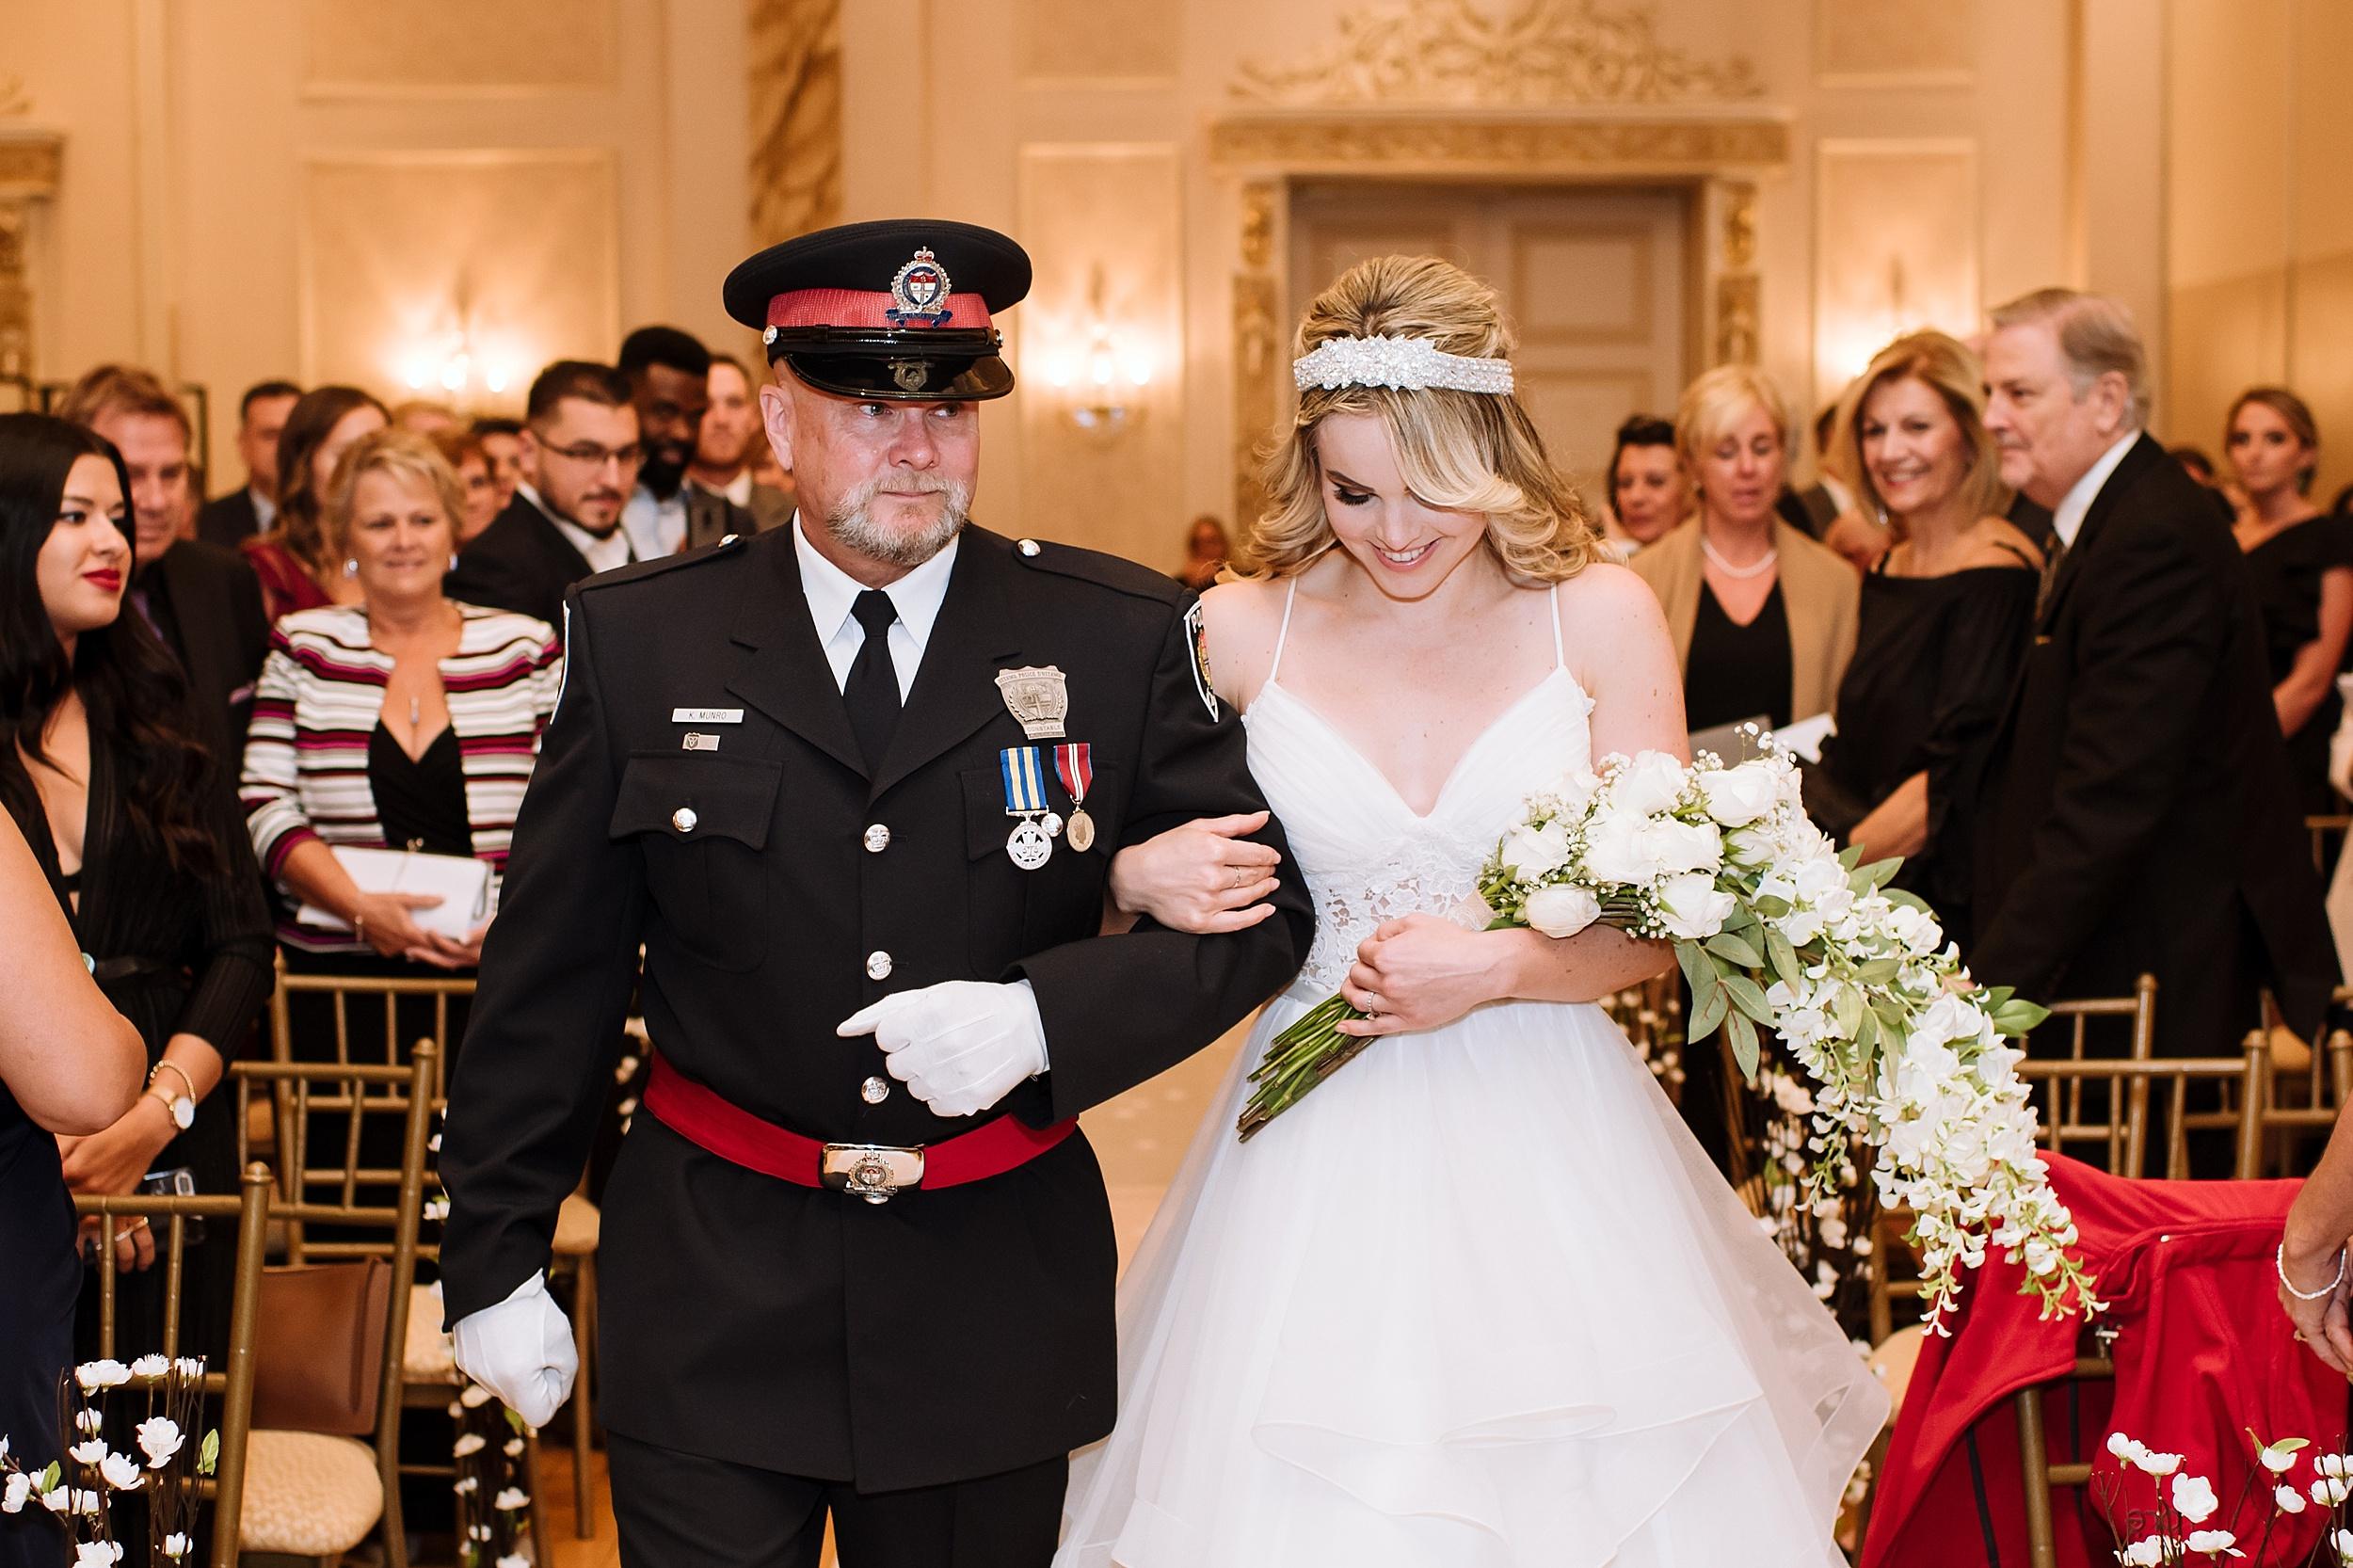 McMichael_Art_Collection_Wedding_chateau_le_jardin_Justine_Munro_Toronto_Photographer051.jpg